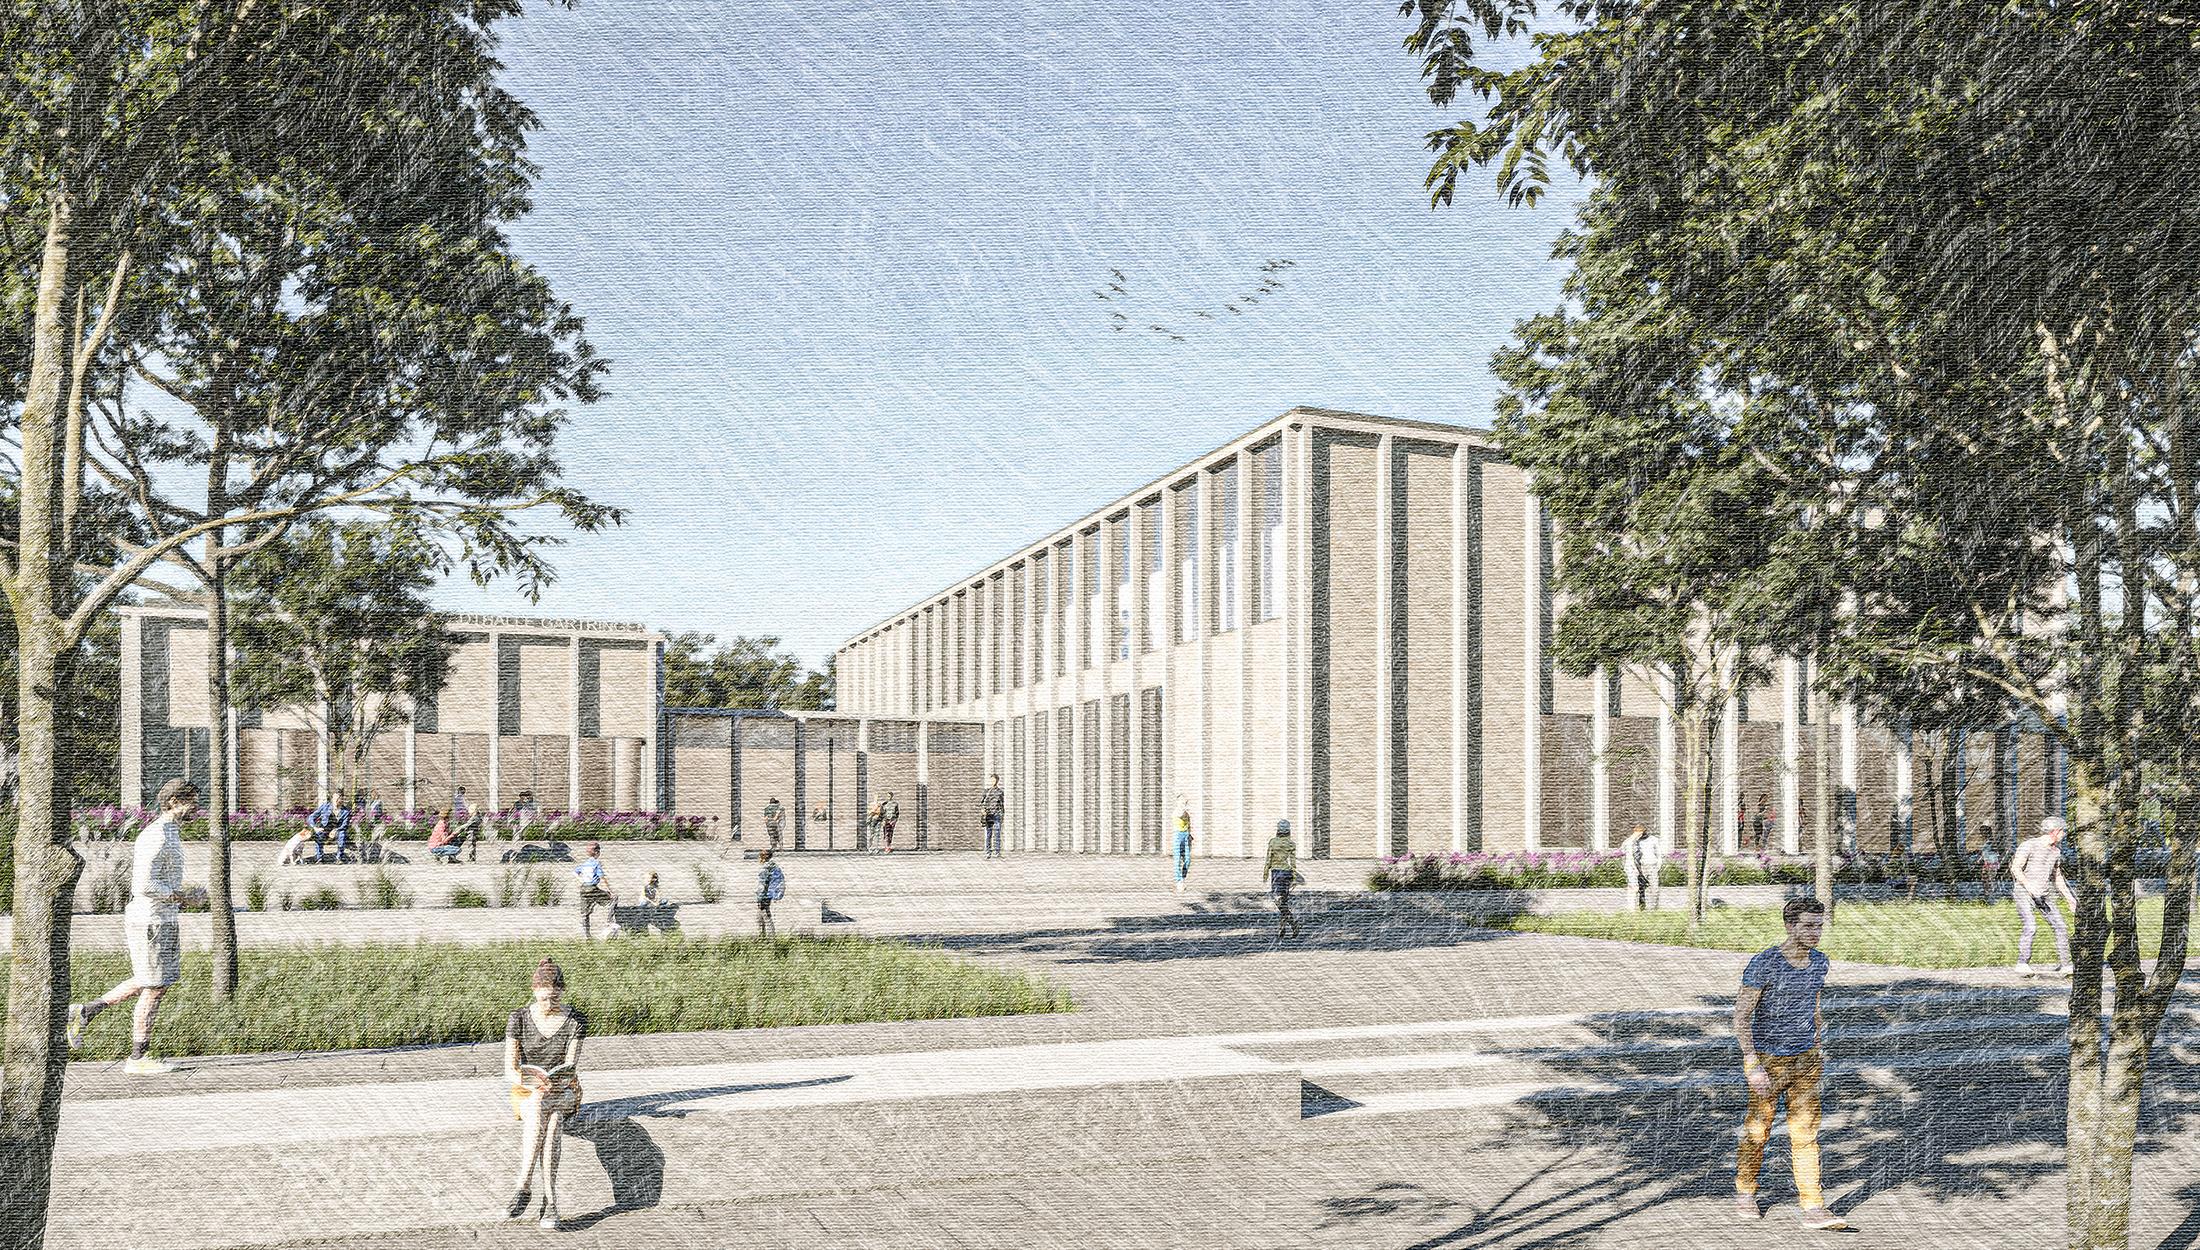 2021, Wettbewerb Neubau Ludwig-Uhland-Halle, Gärtringen